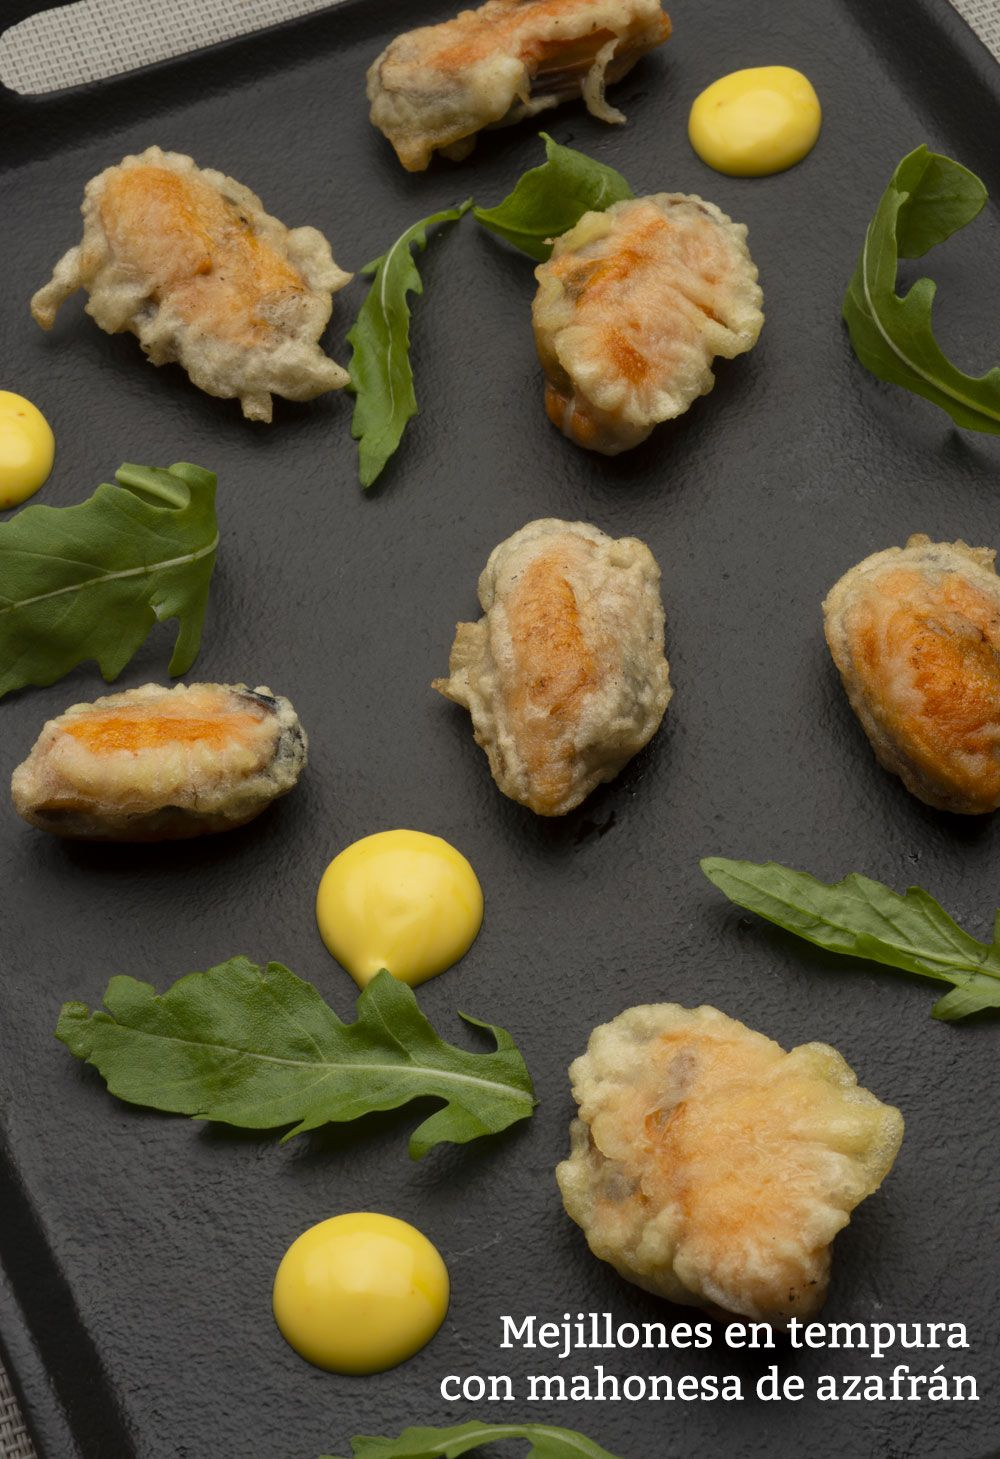 Mejillones en tempura con mahonesa de azafrán.